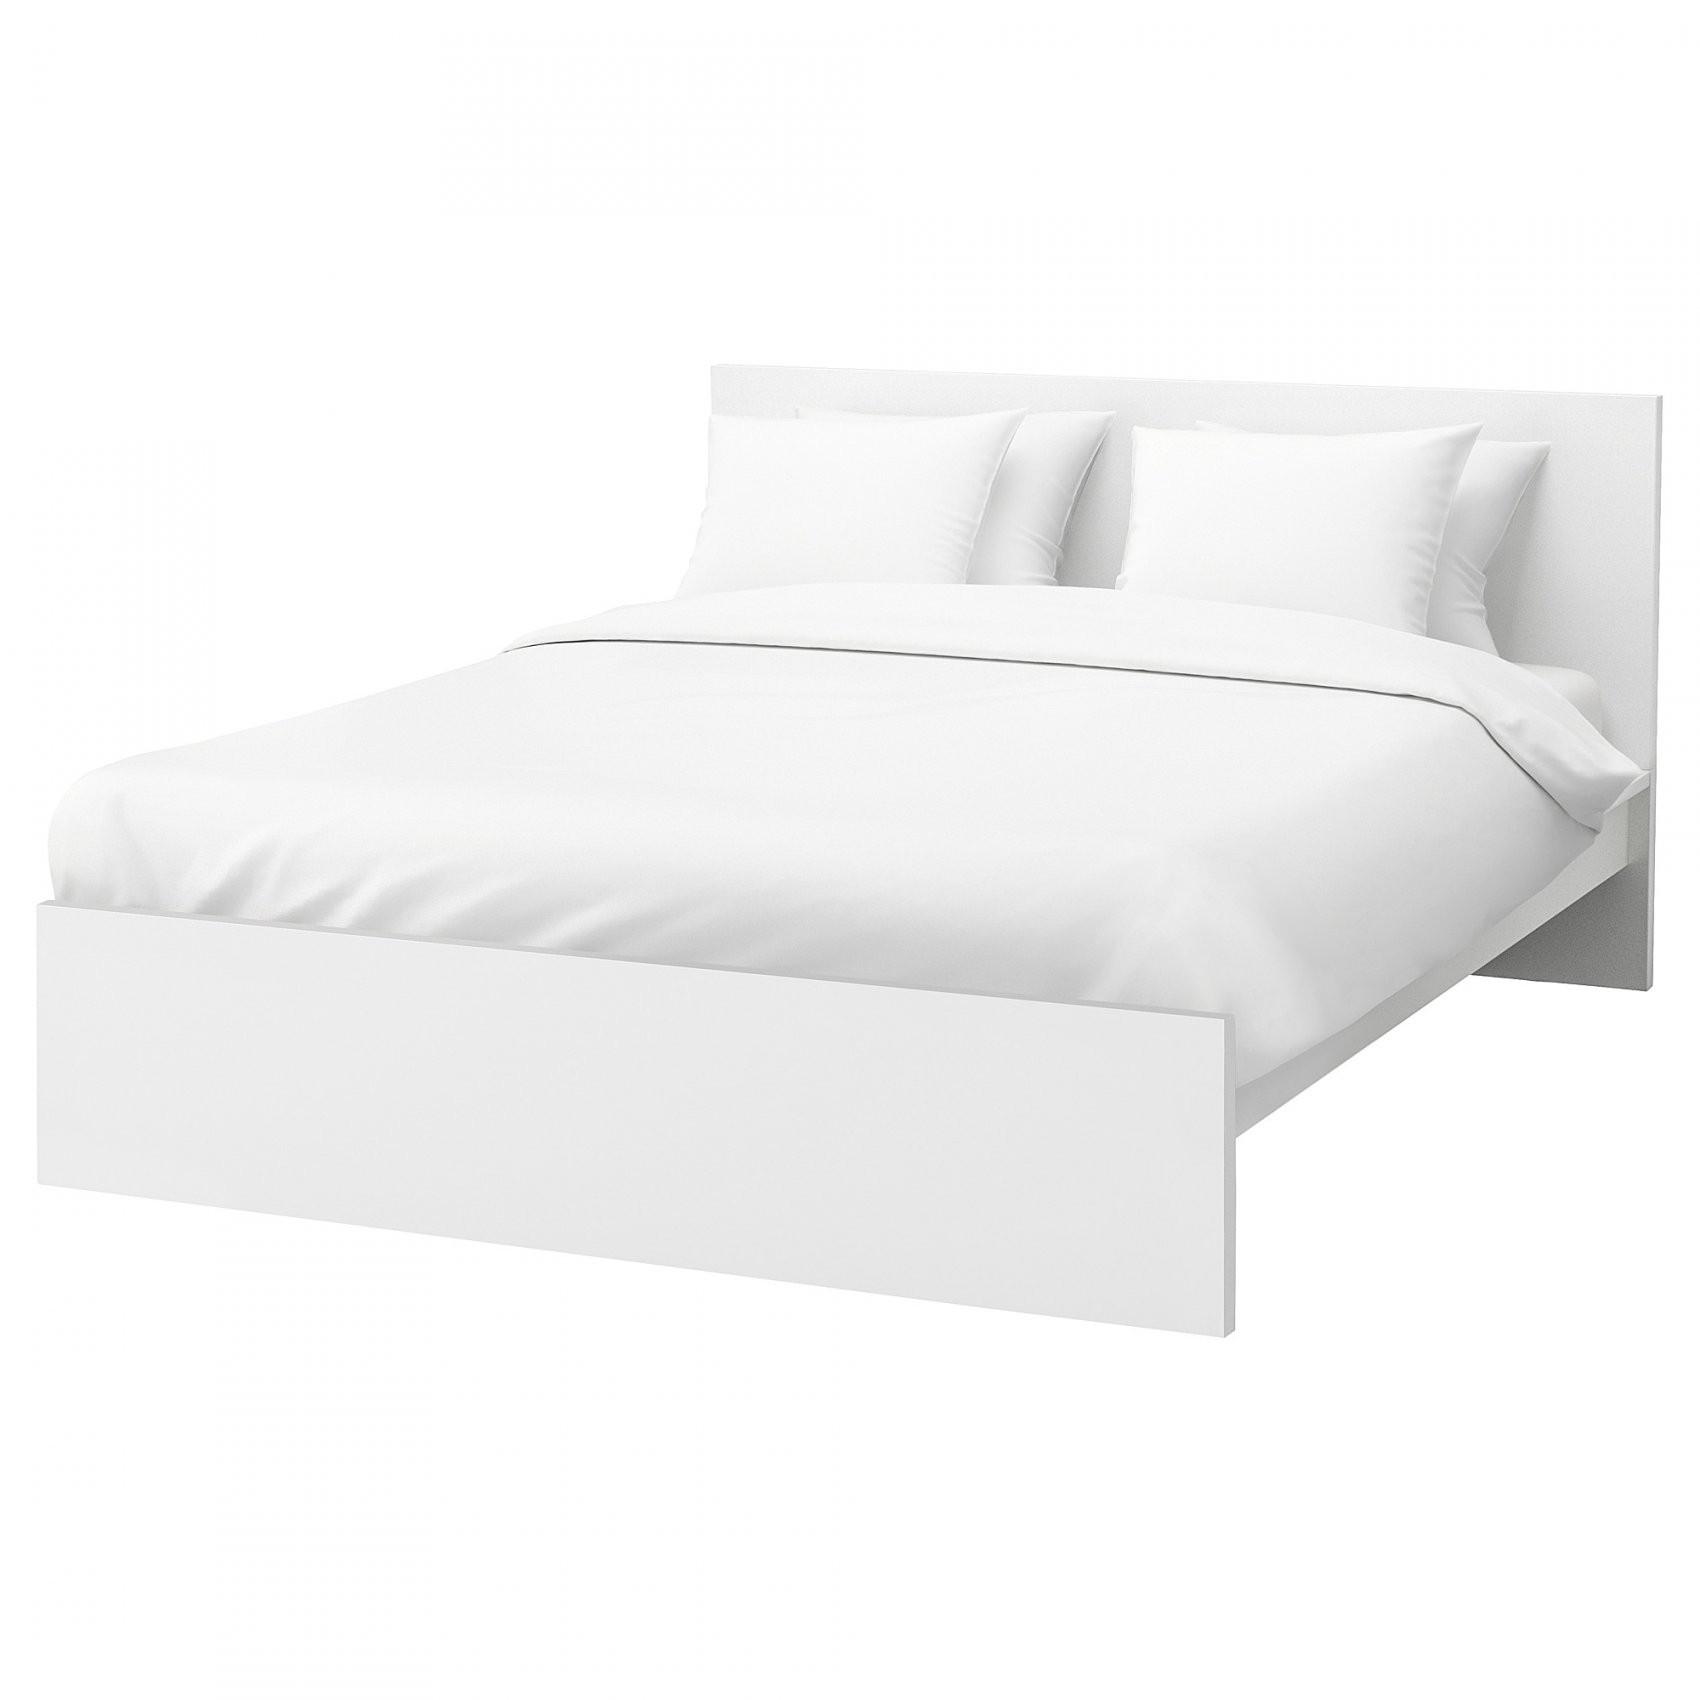 Malm Bettgestell Hoch  Weiß  Ikea von Ikea Bett Malm 140X200 Weiß Photo